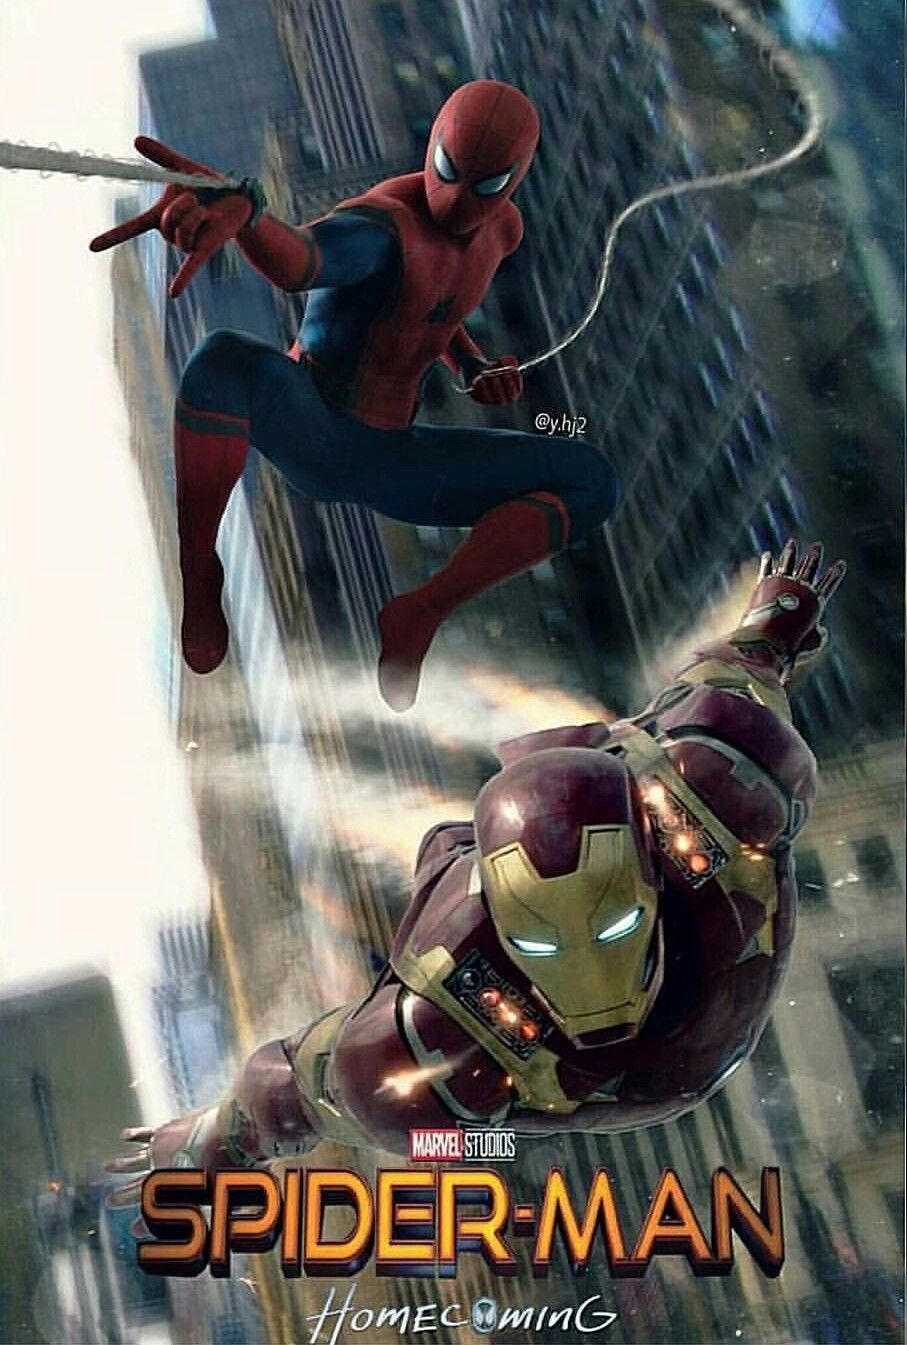 SpiderMan & IronMan From Marvel spiderman